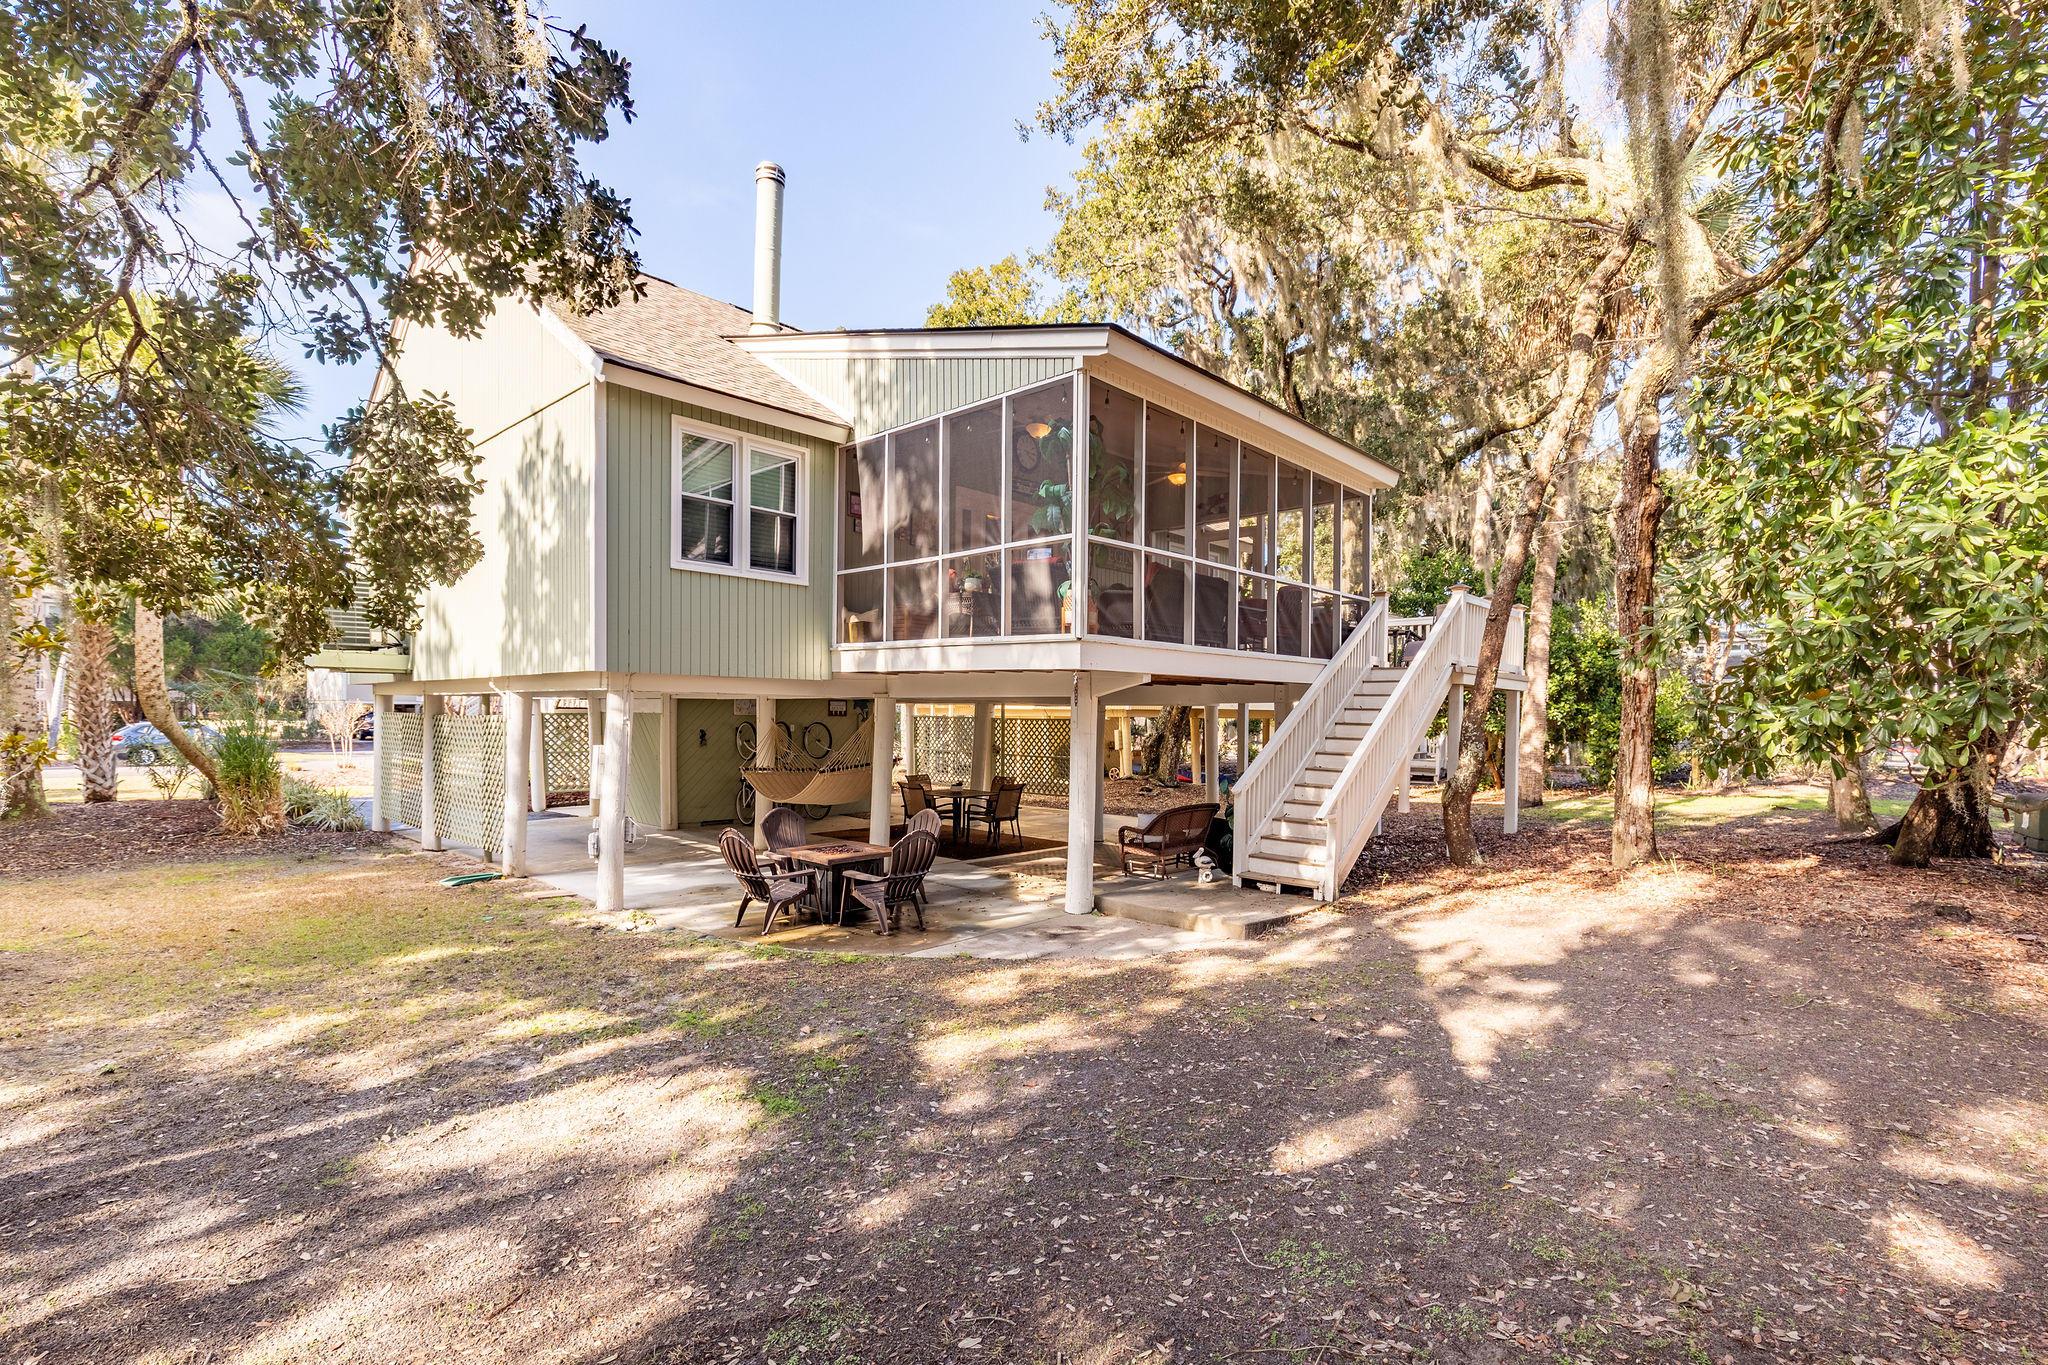 Seabrook Island Homes For Sale - 515 Cobby Creek, Seabrook Island, SC - 19